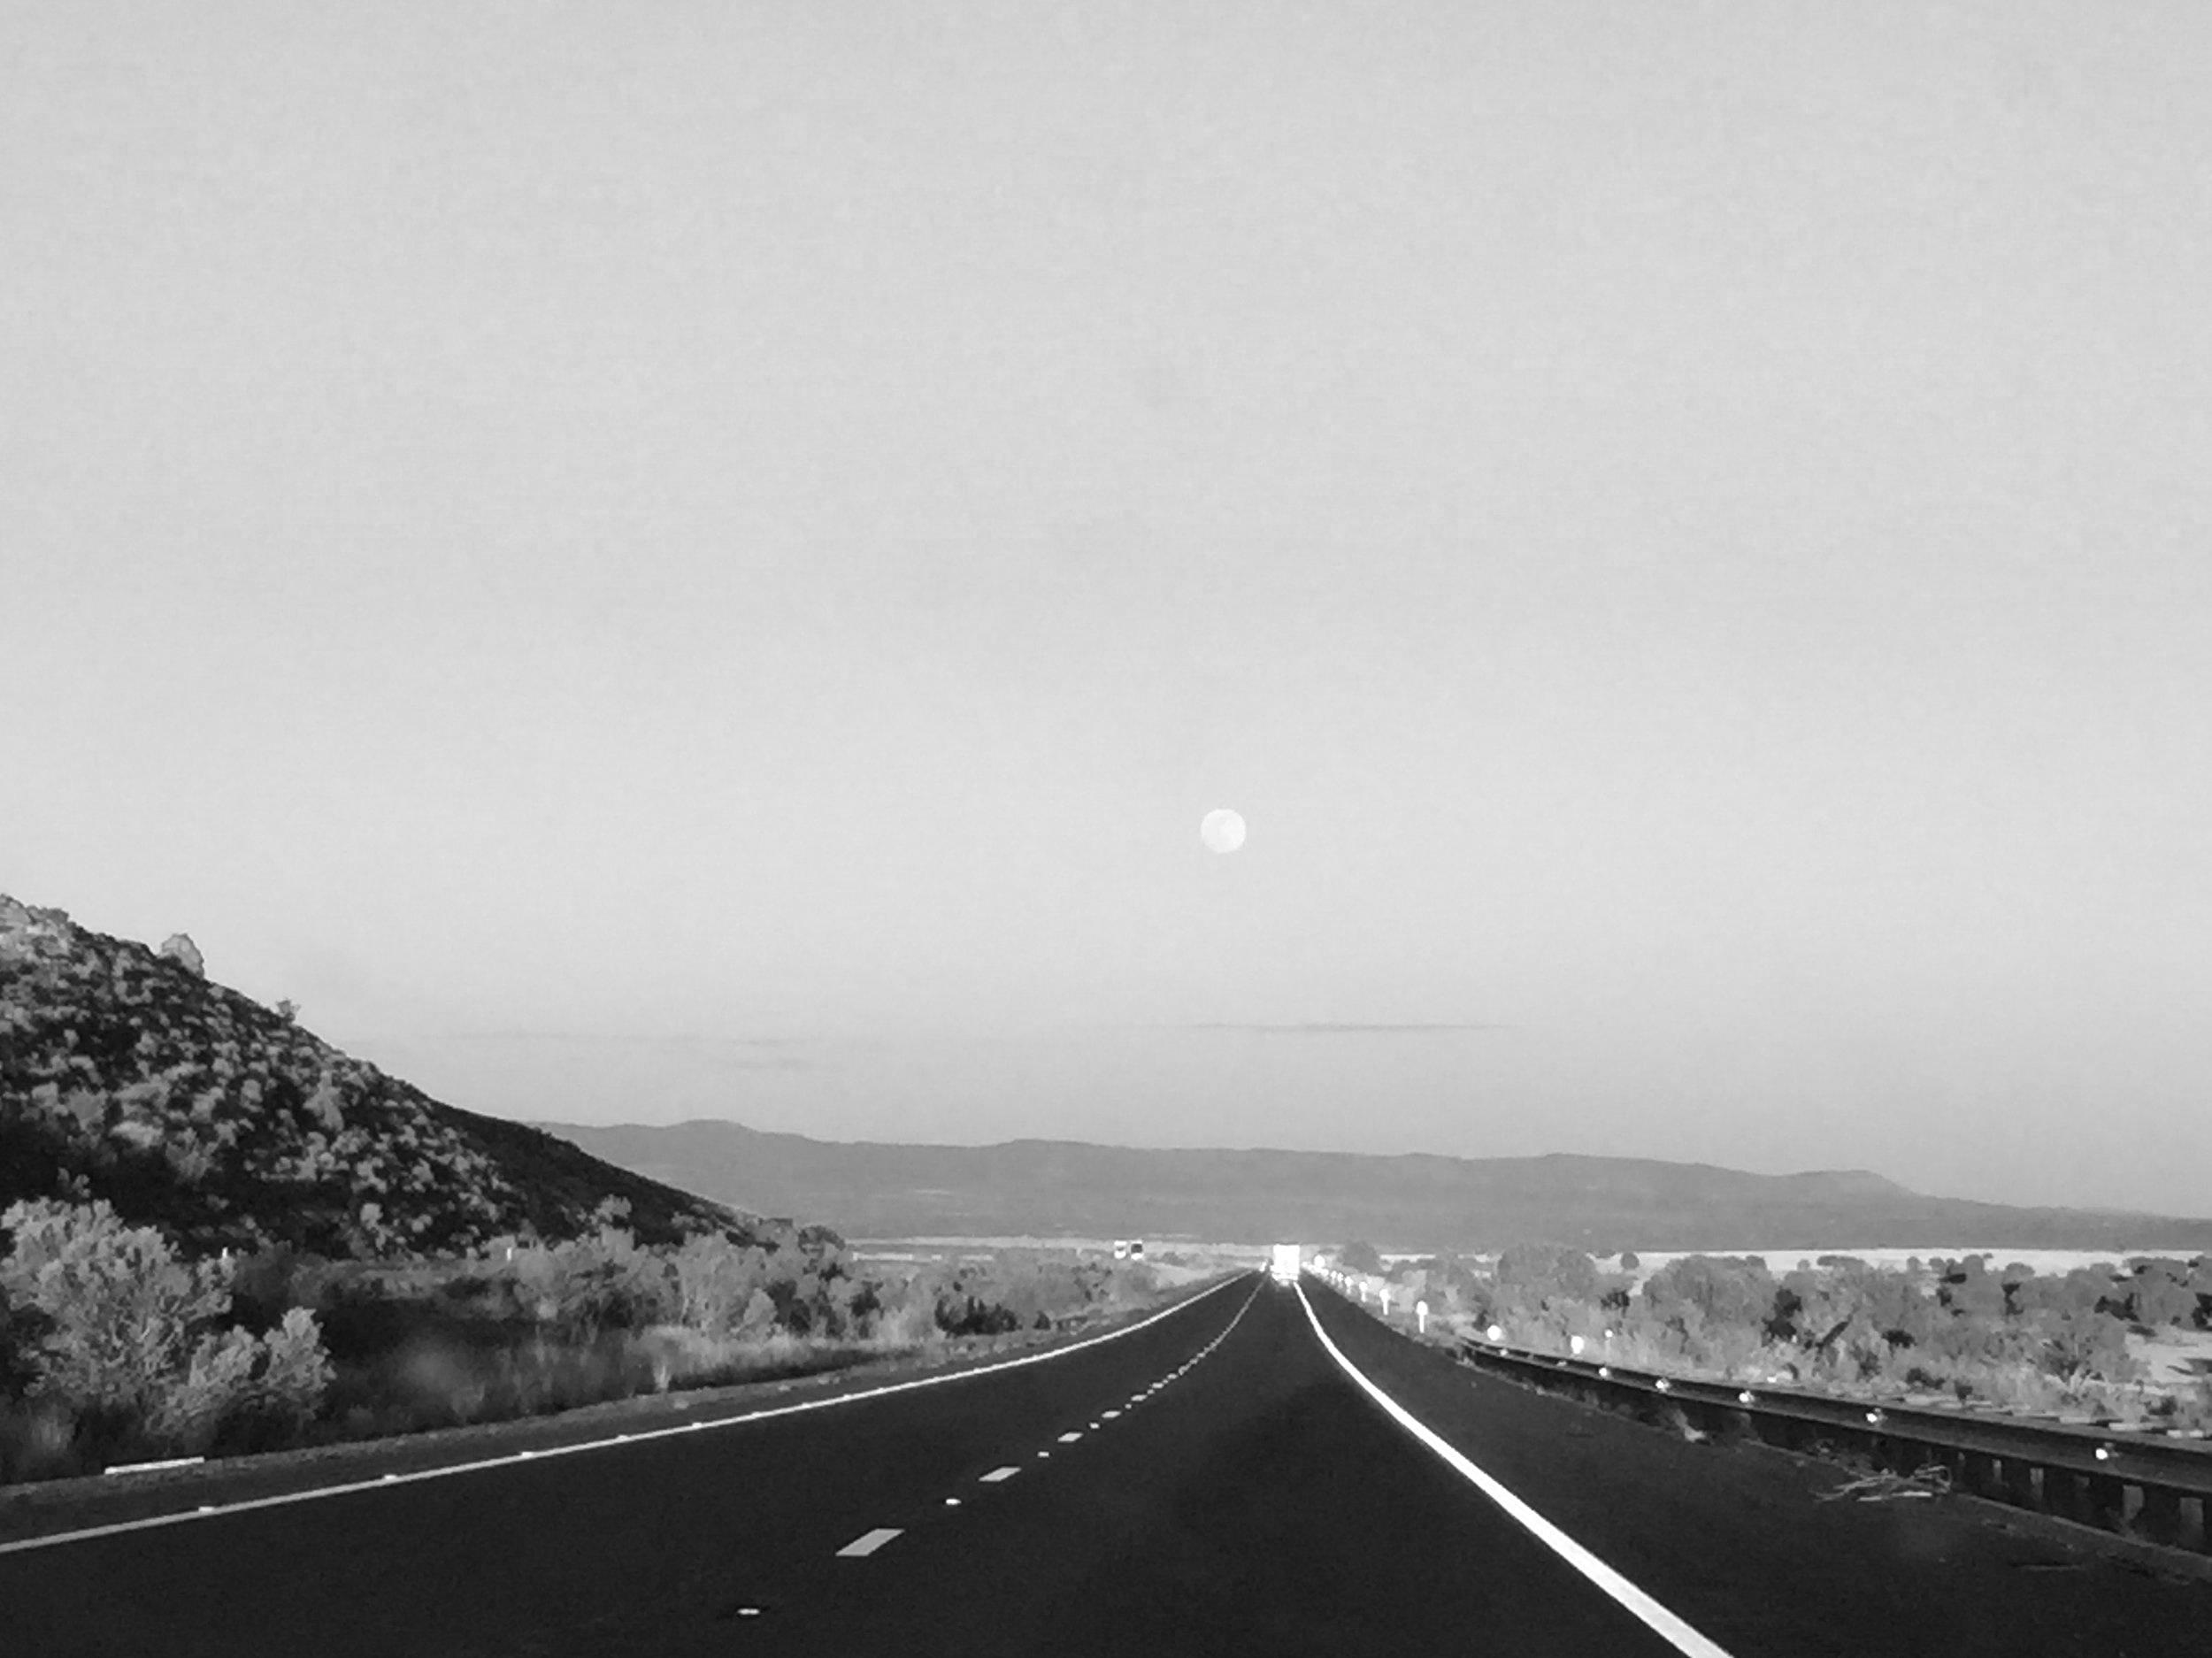 On the road_Arizona2.jpg